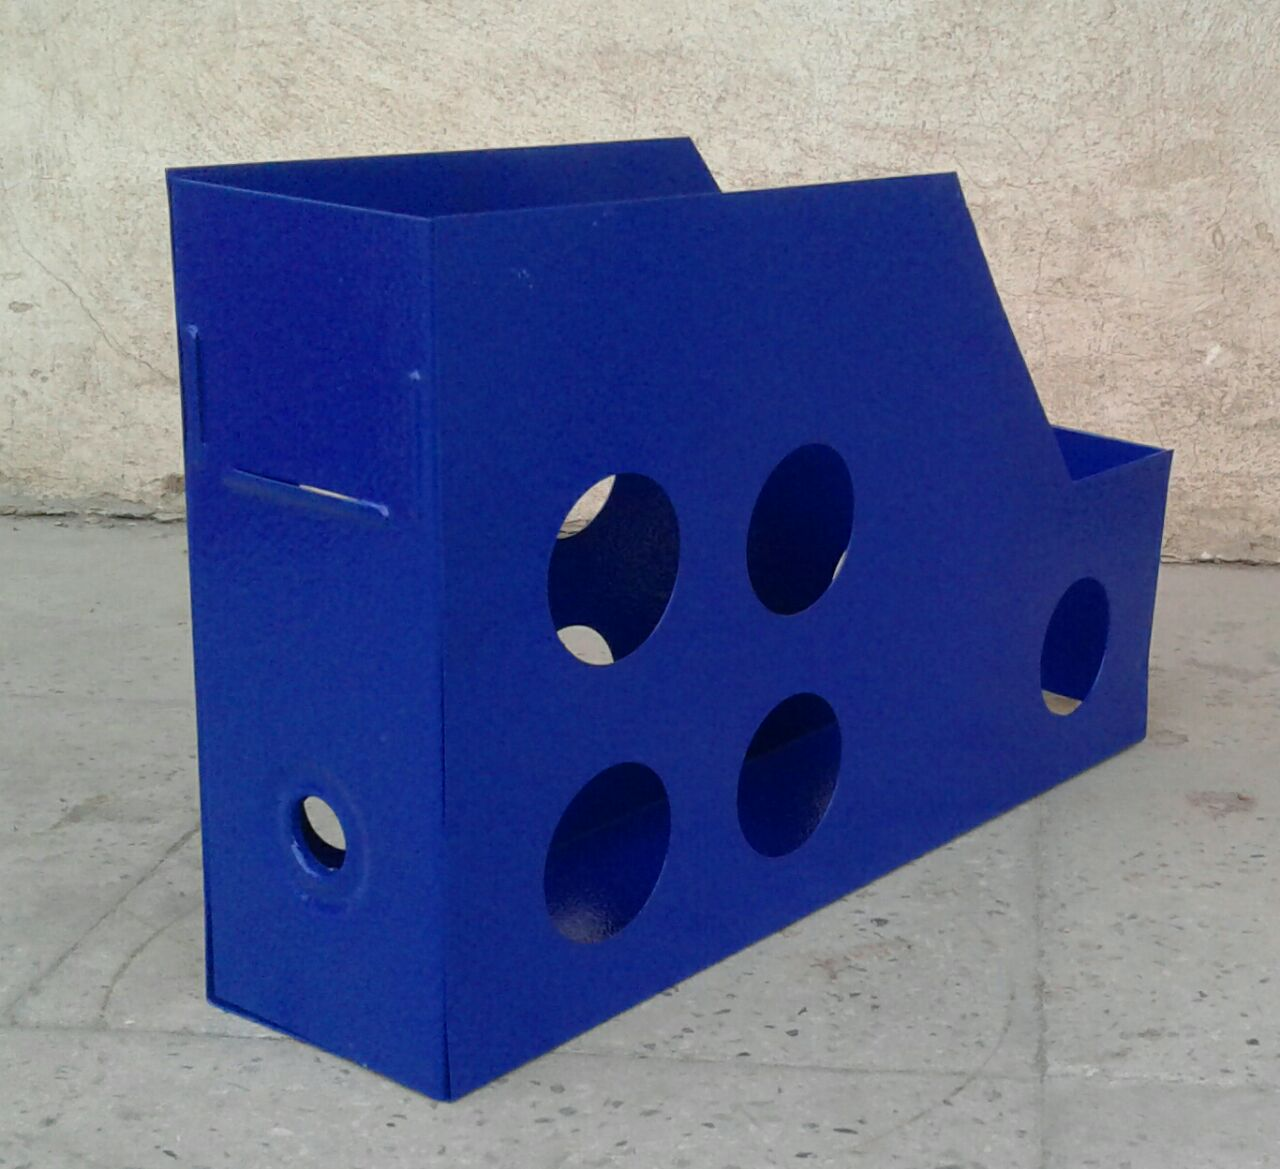 IMG 20180412 213725 - زونکن فلزی,فایل باکس فلزی کارسیس